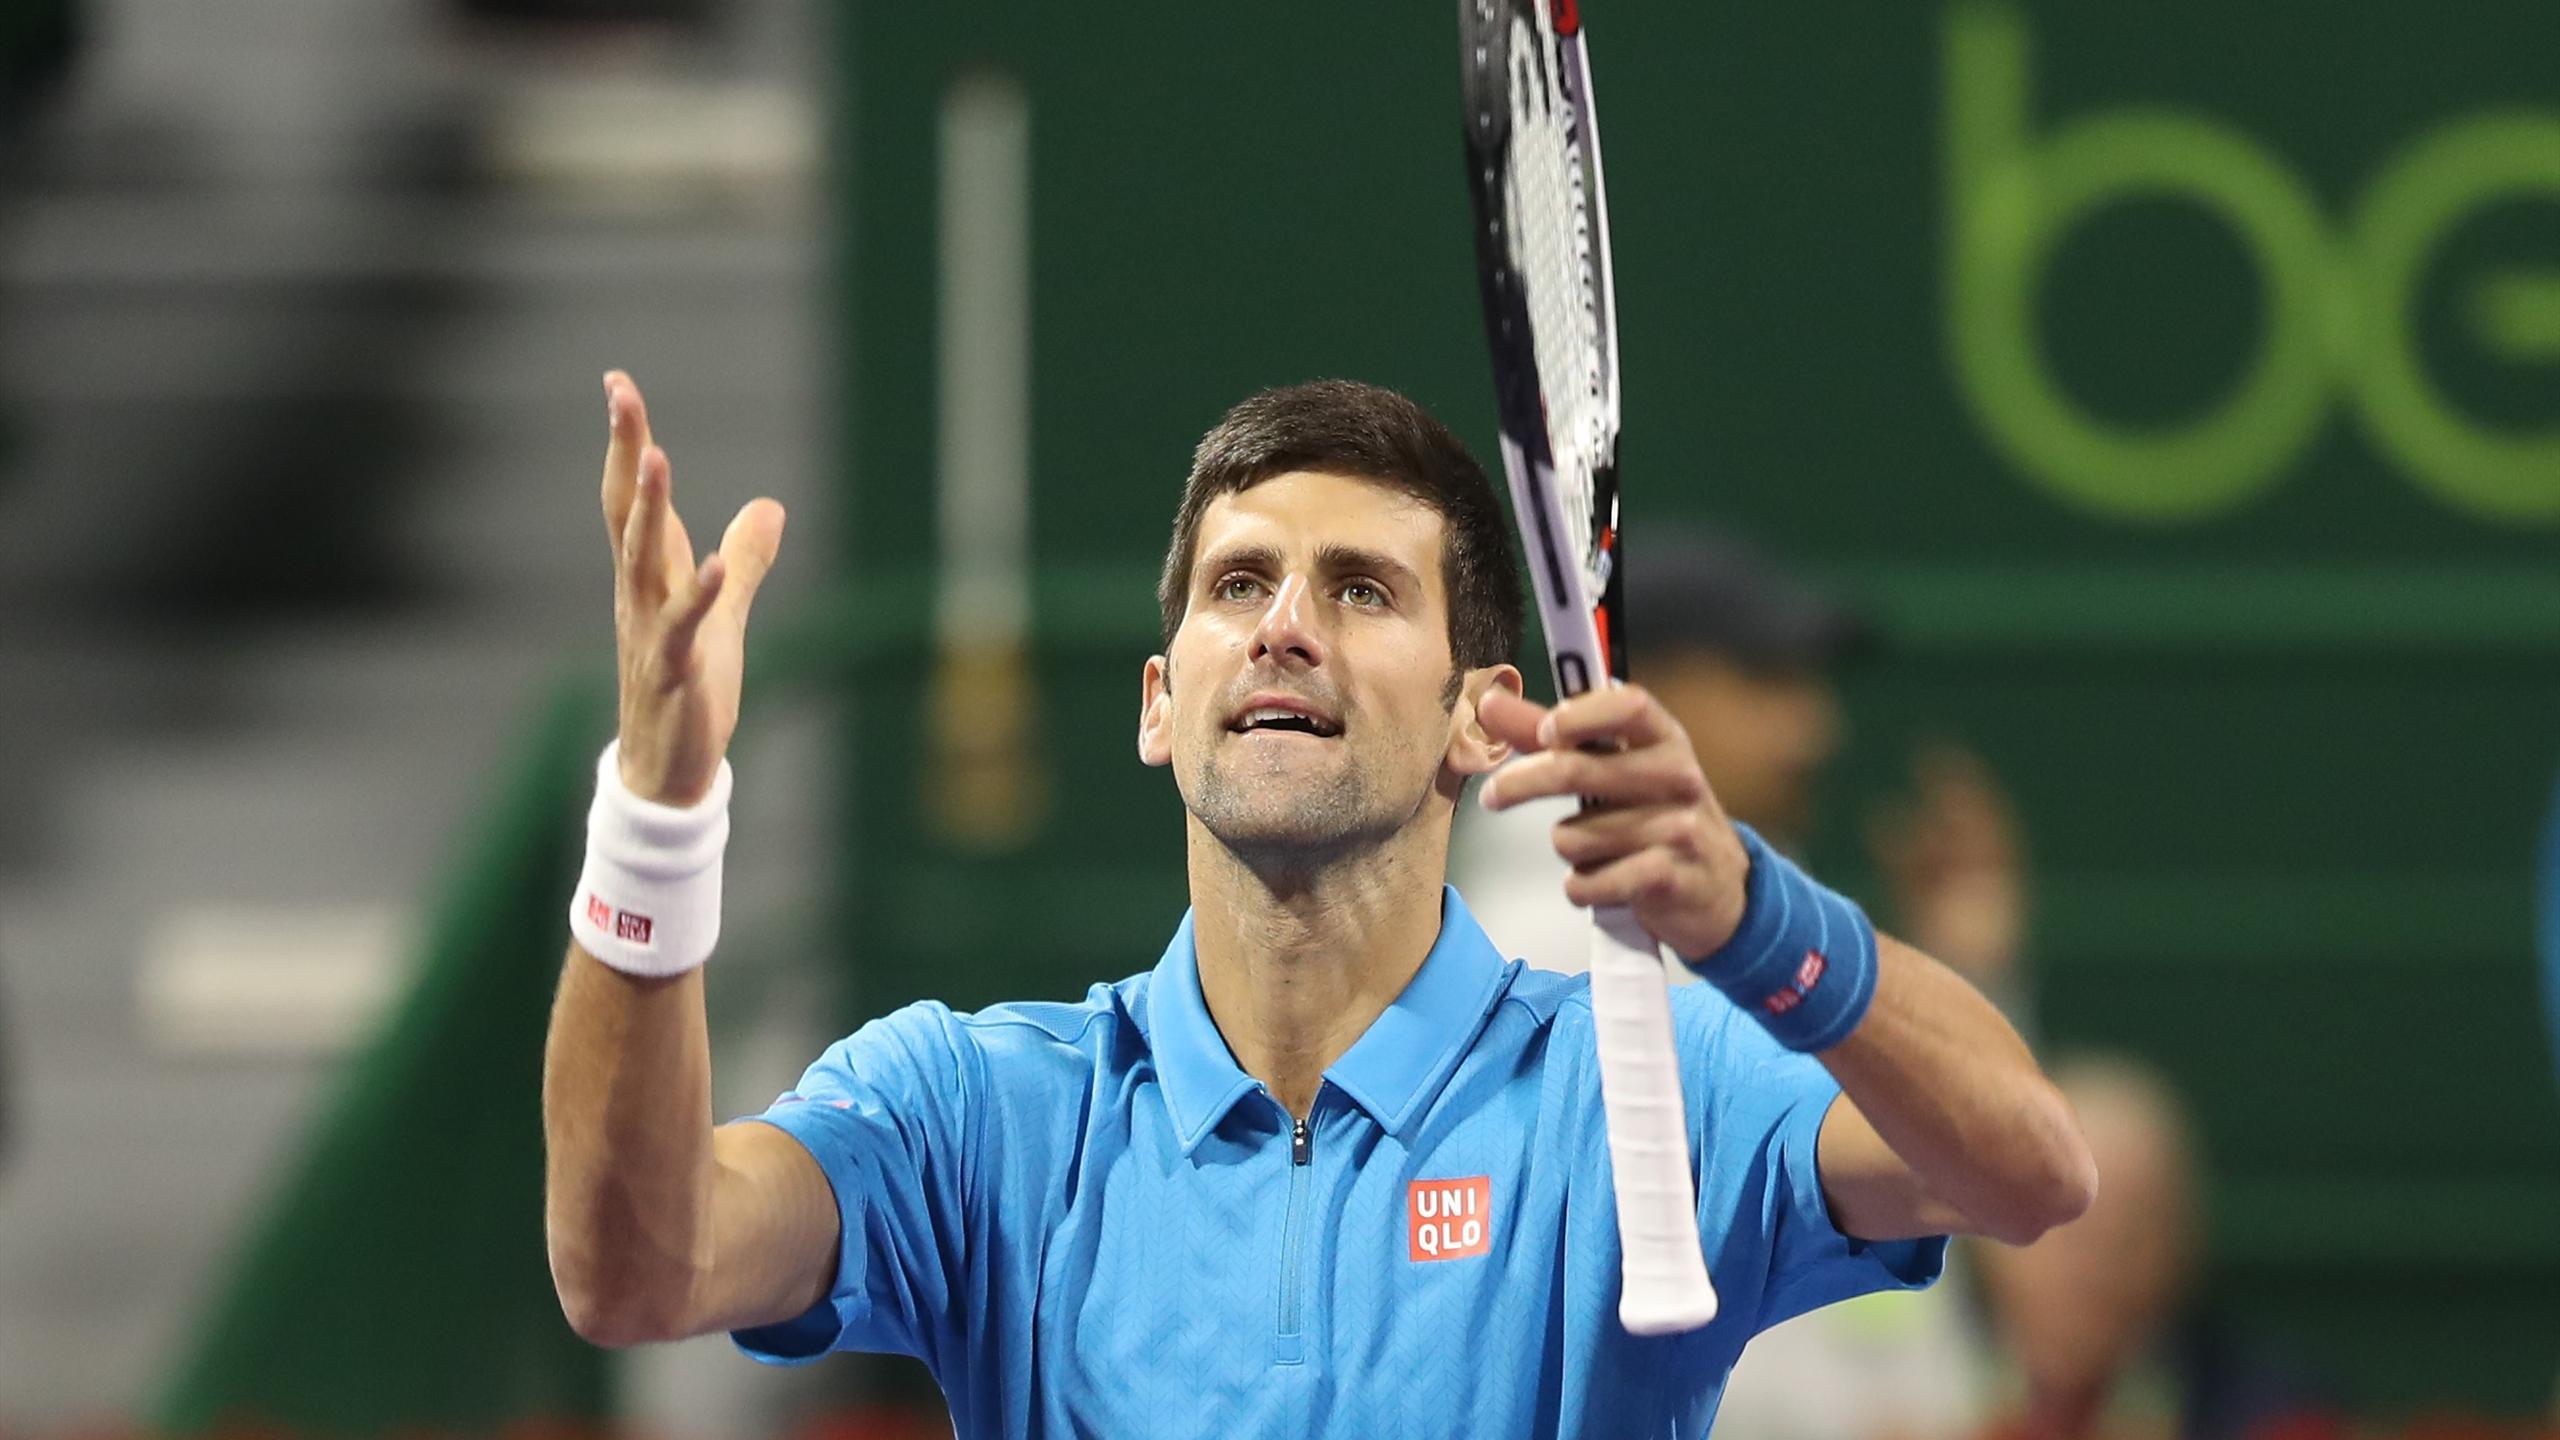 Novak Djokovic, vainqueur dans la douleur de Fernando Verdasco à Doha